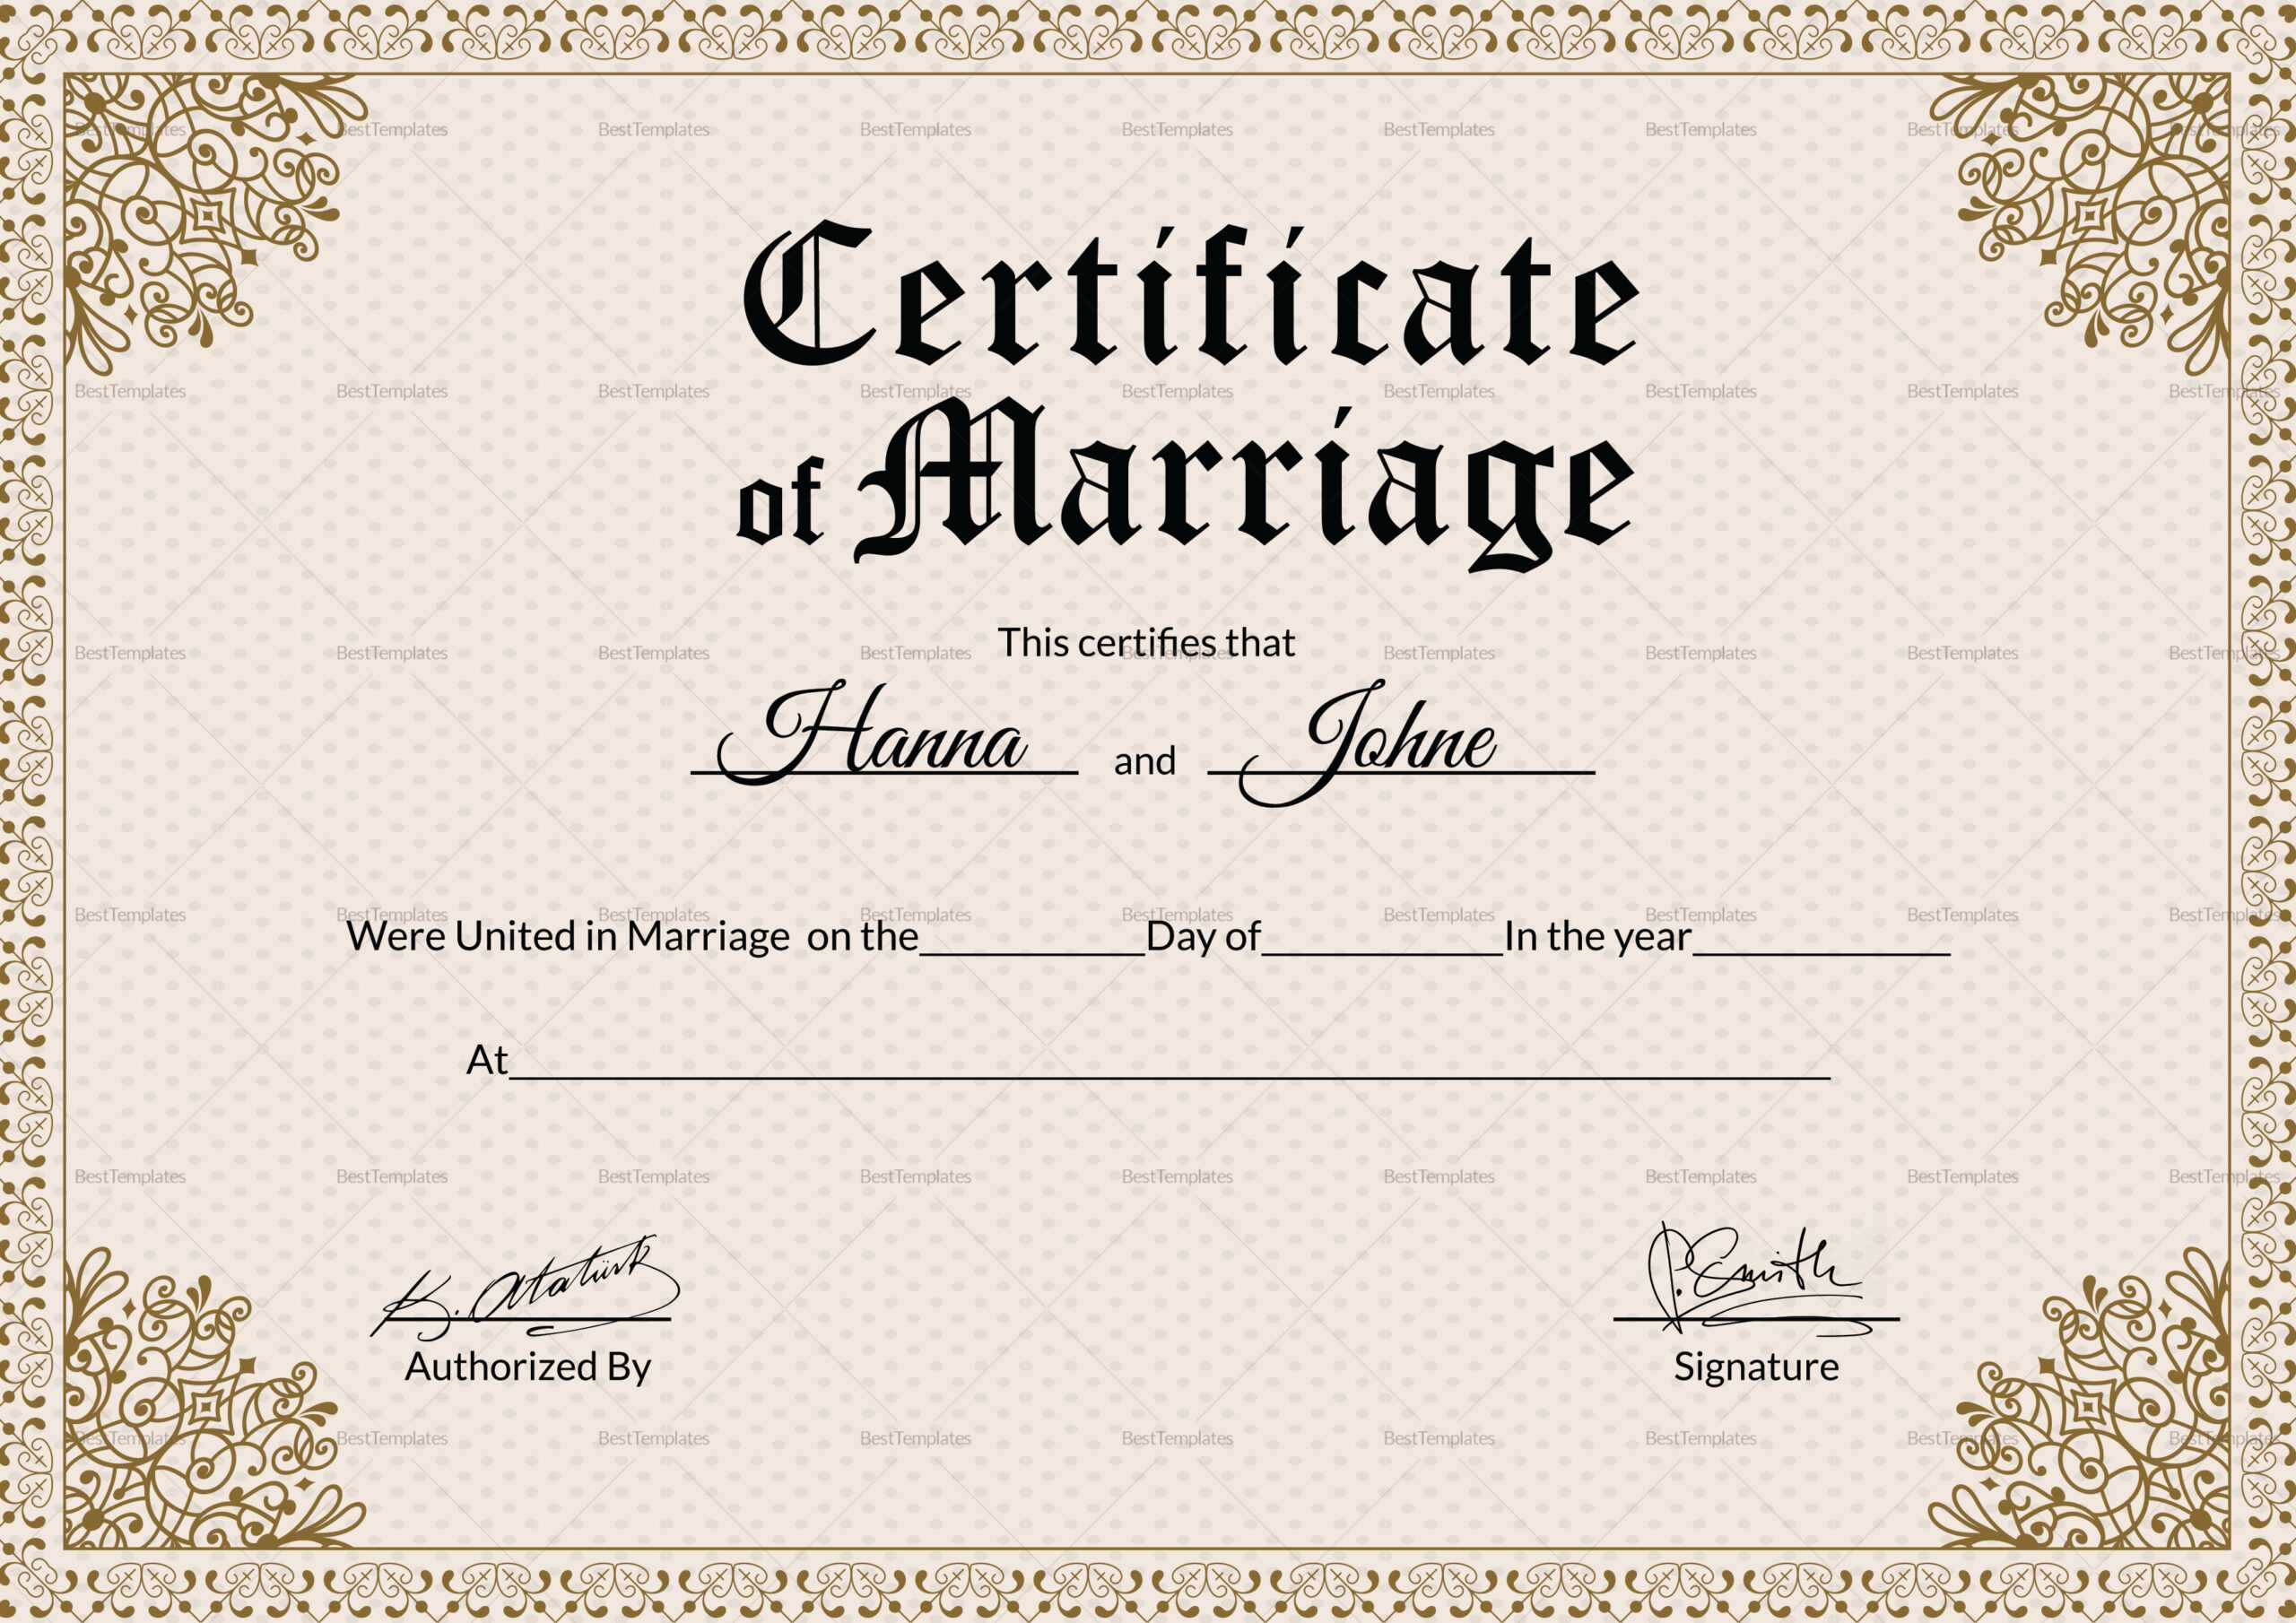 Keepsake Marriage Certificate Template Pertaining To Certificate Of Marriage Template